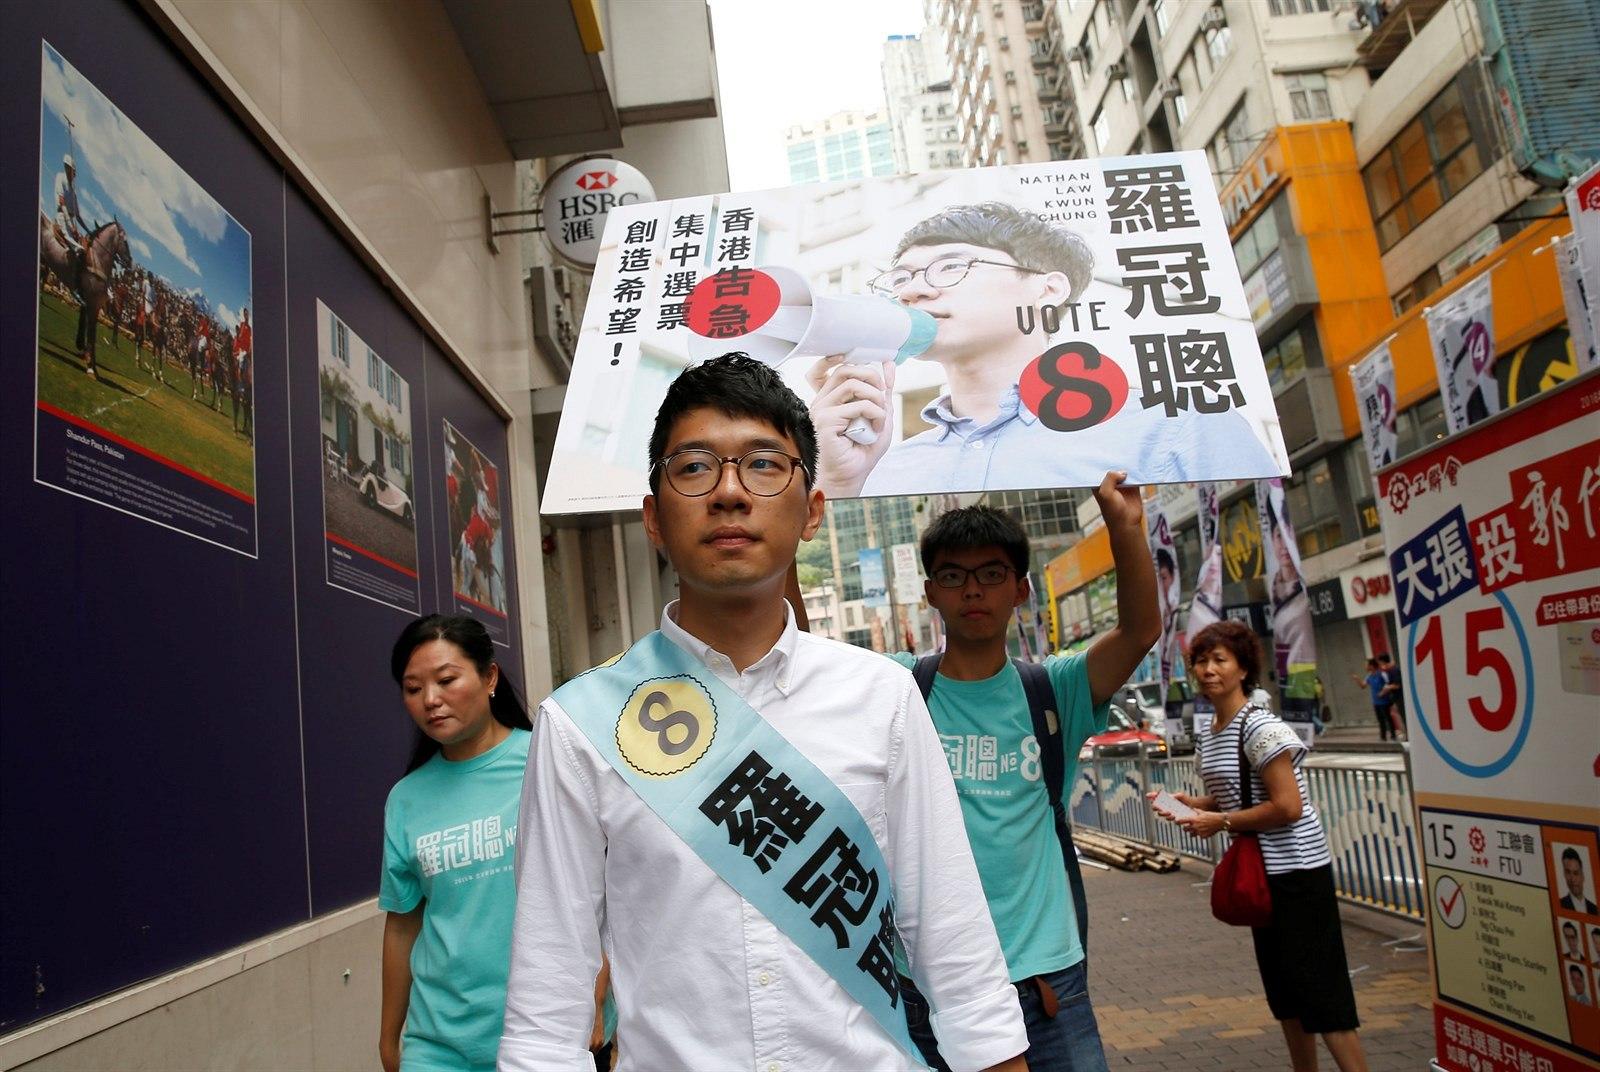 Výsledek obrázku pro foto hong kong studenti